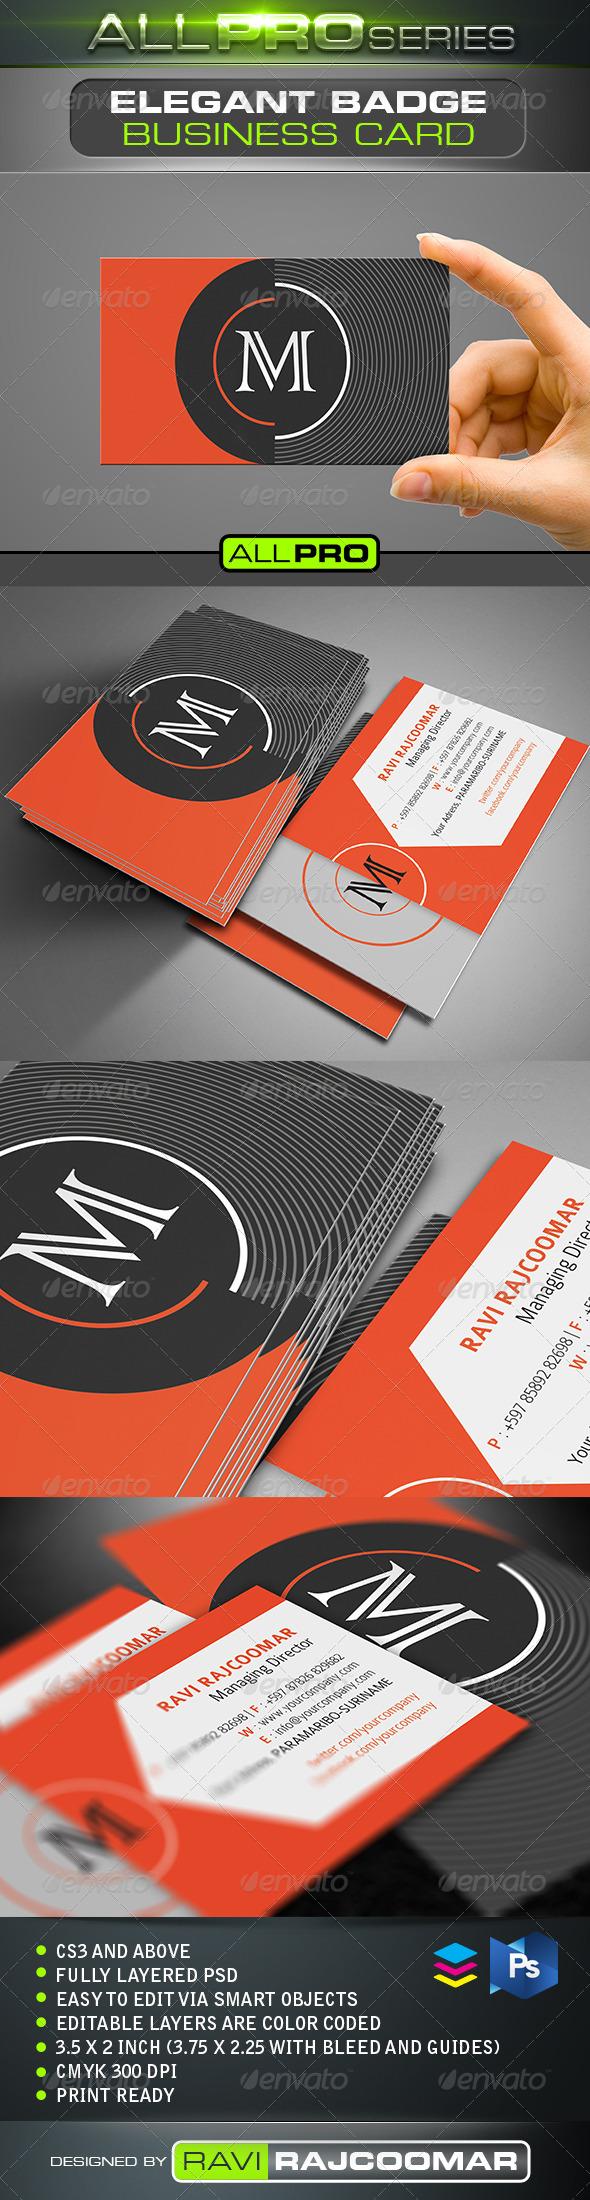 Elegant Badge Business Card - Business Cards Print Templates